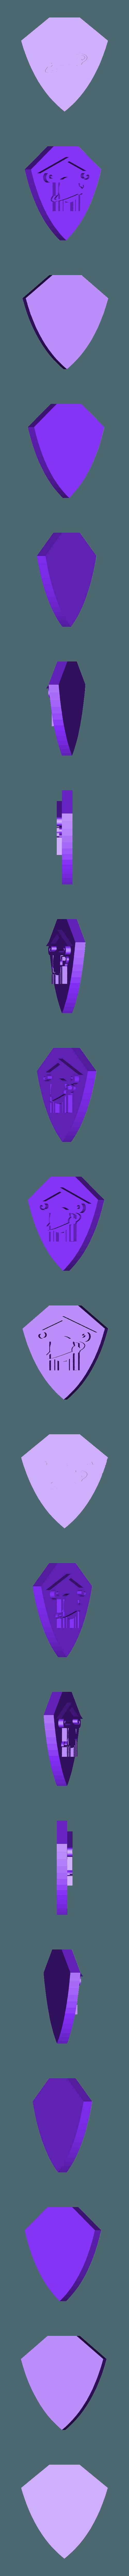 kfgzlogo.STL Download free STL file School logo • 3D printer model, rpeti240